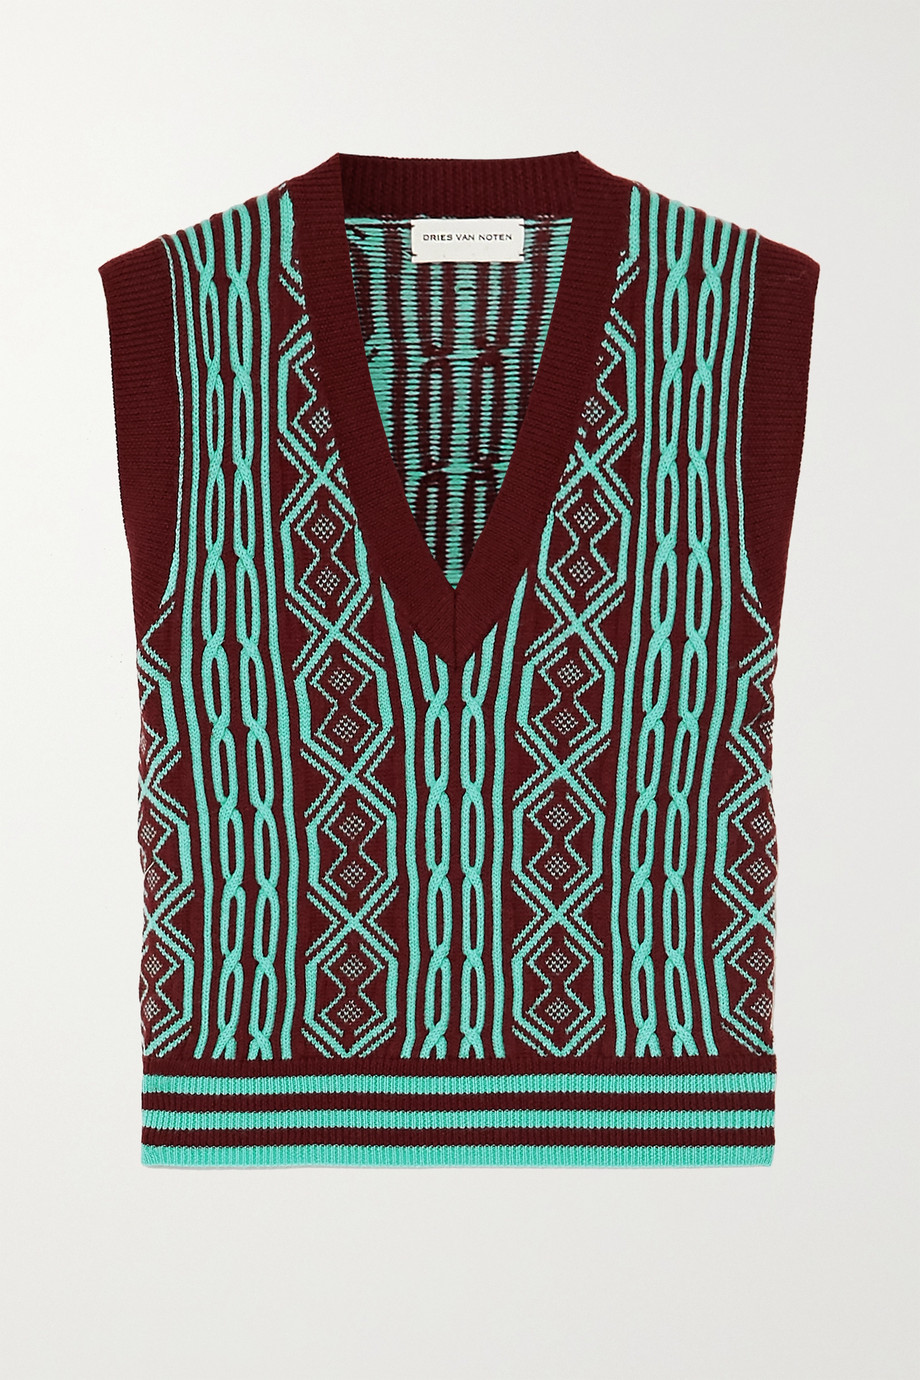 Dries Van Noten Intarsia merino wool tank